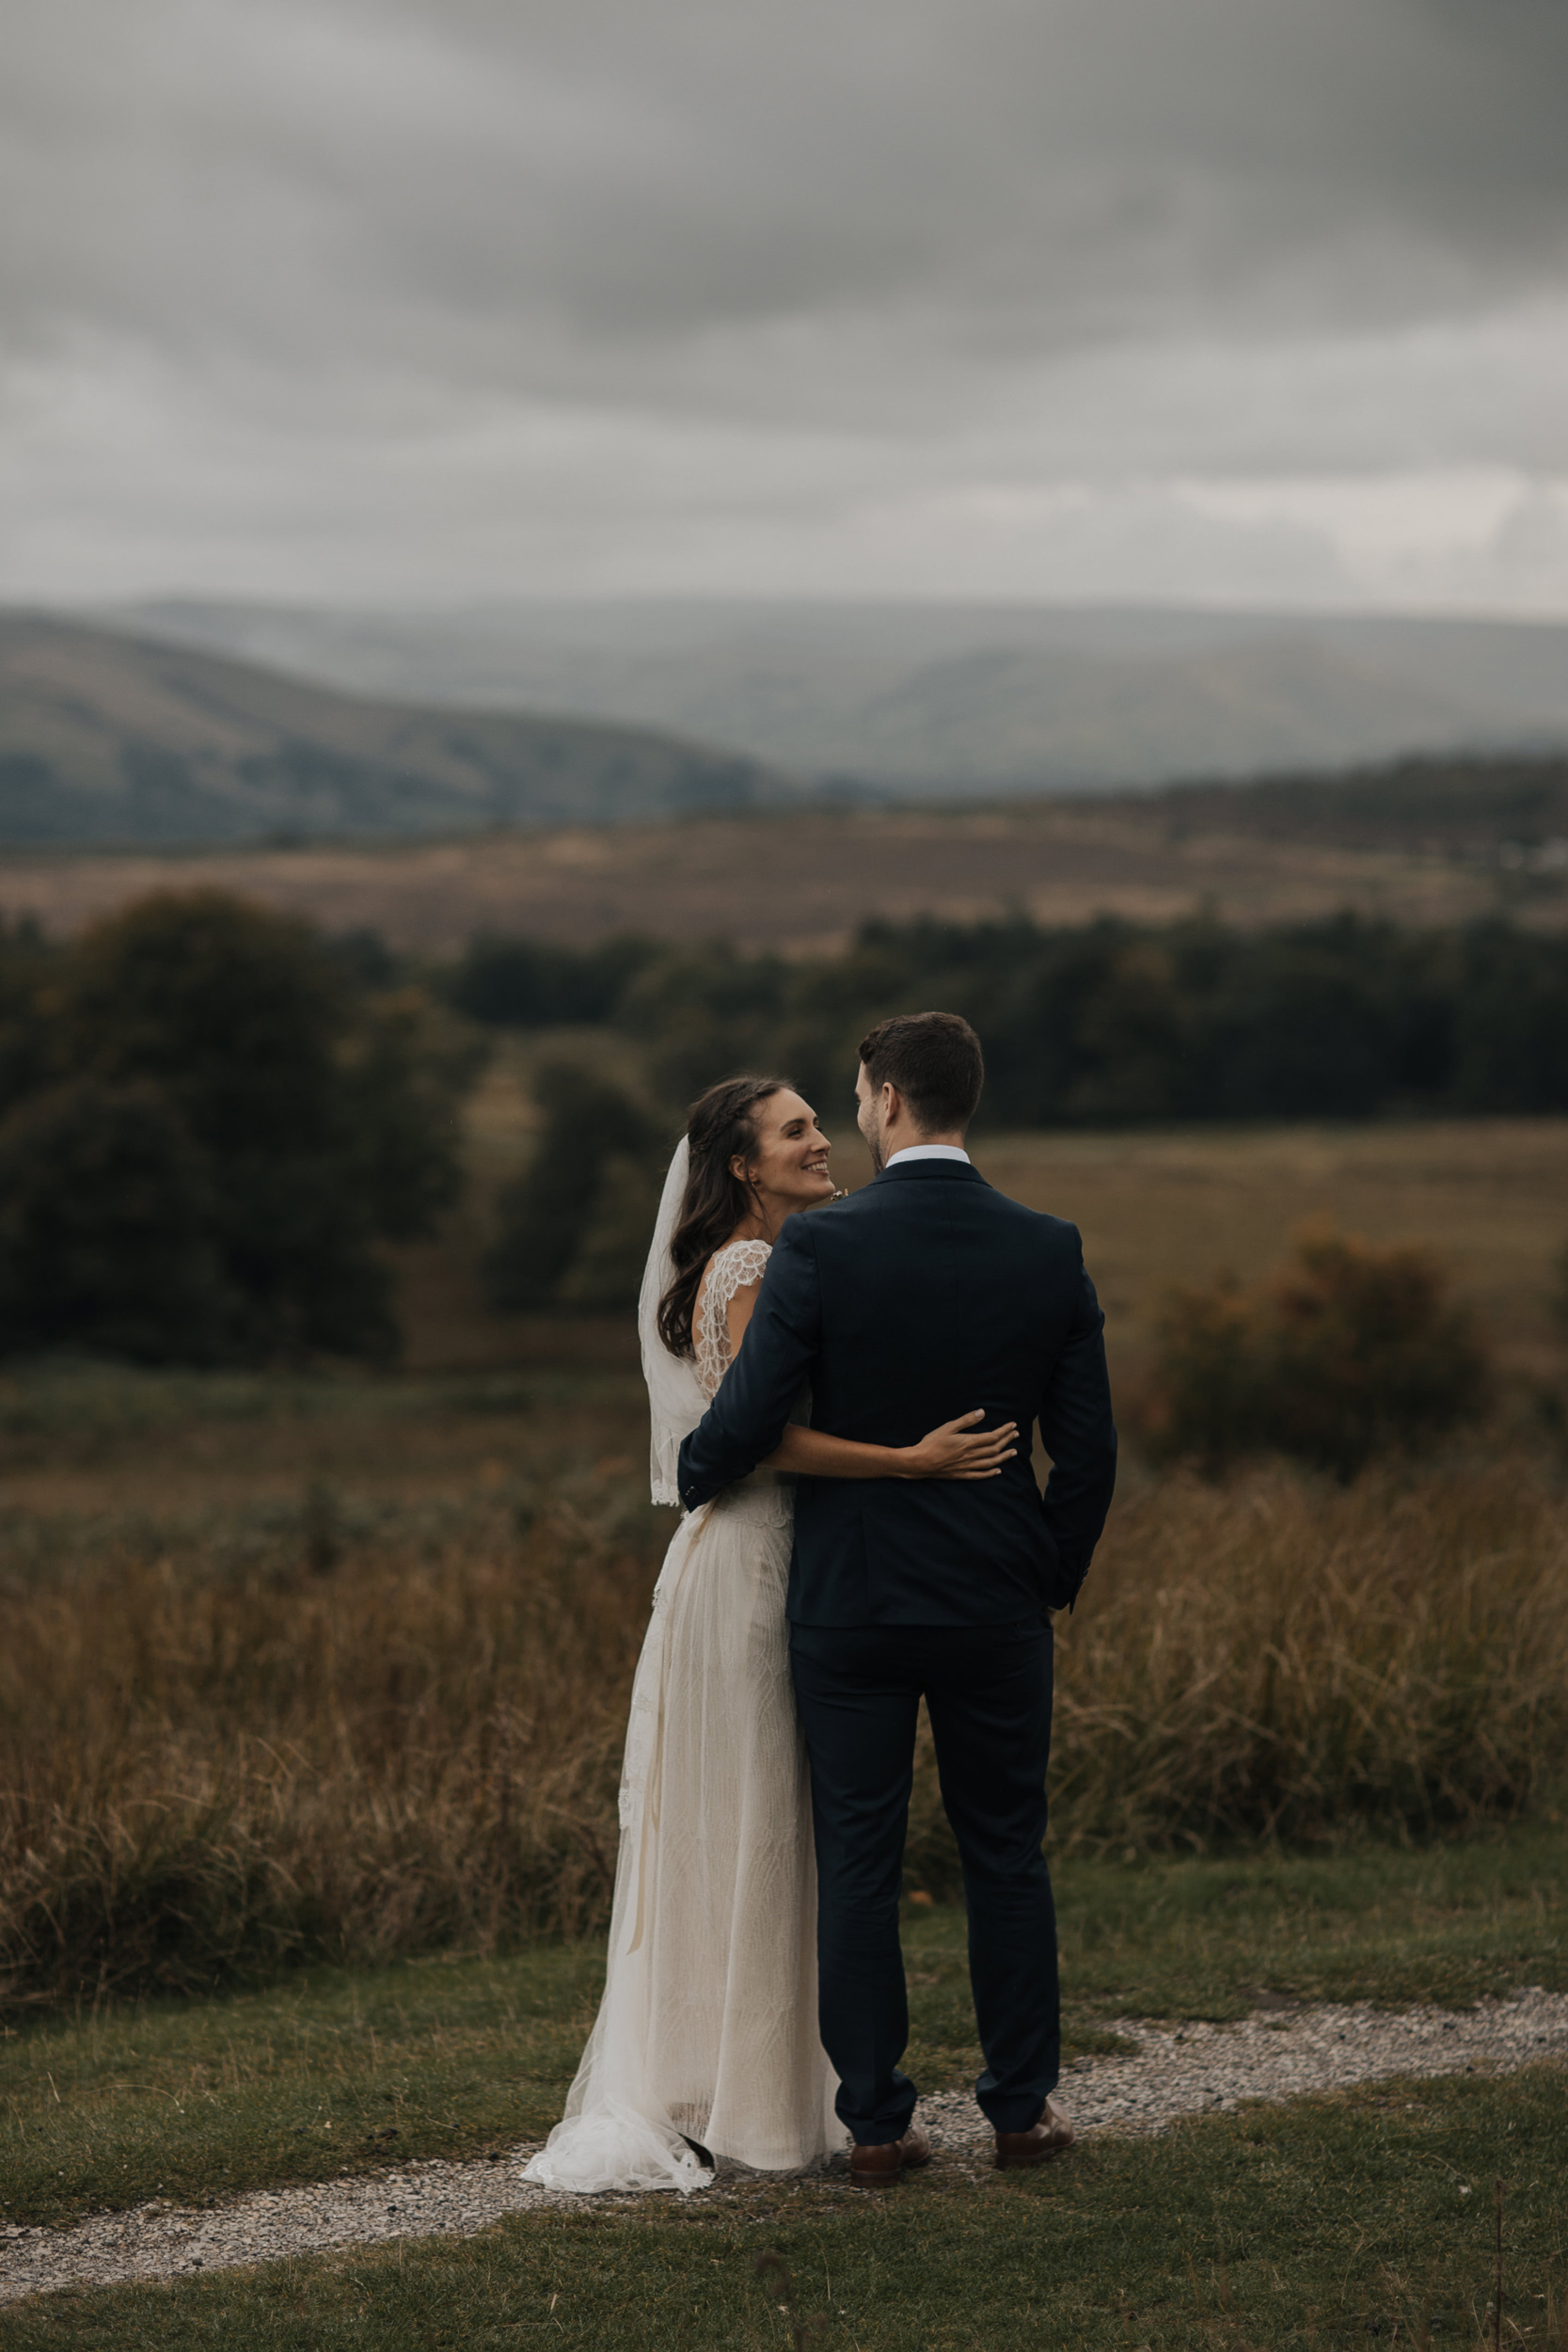 Joasia-Kate-Beaumont-Bohemian-Lace-Wedding-Dress-Peak-District-Sheffield-Wedding-25.jpg